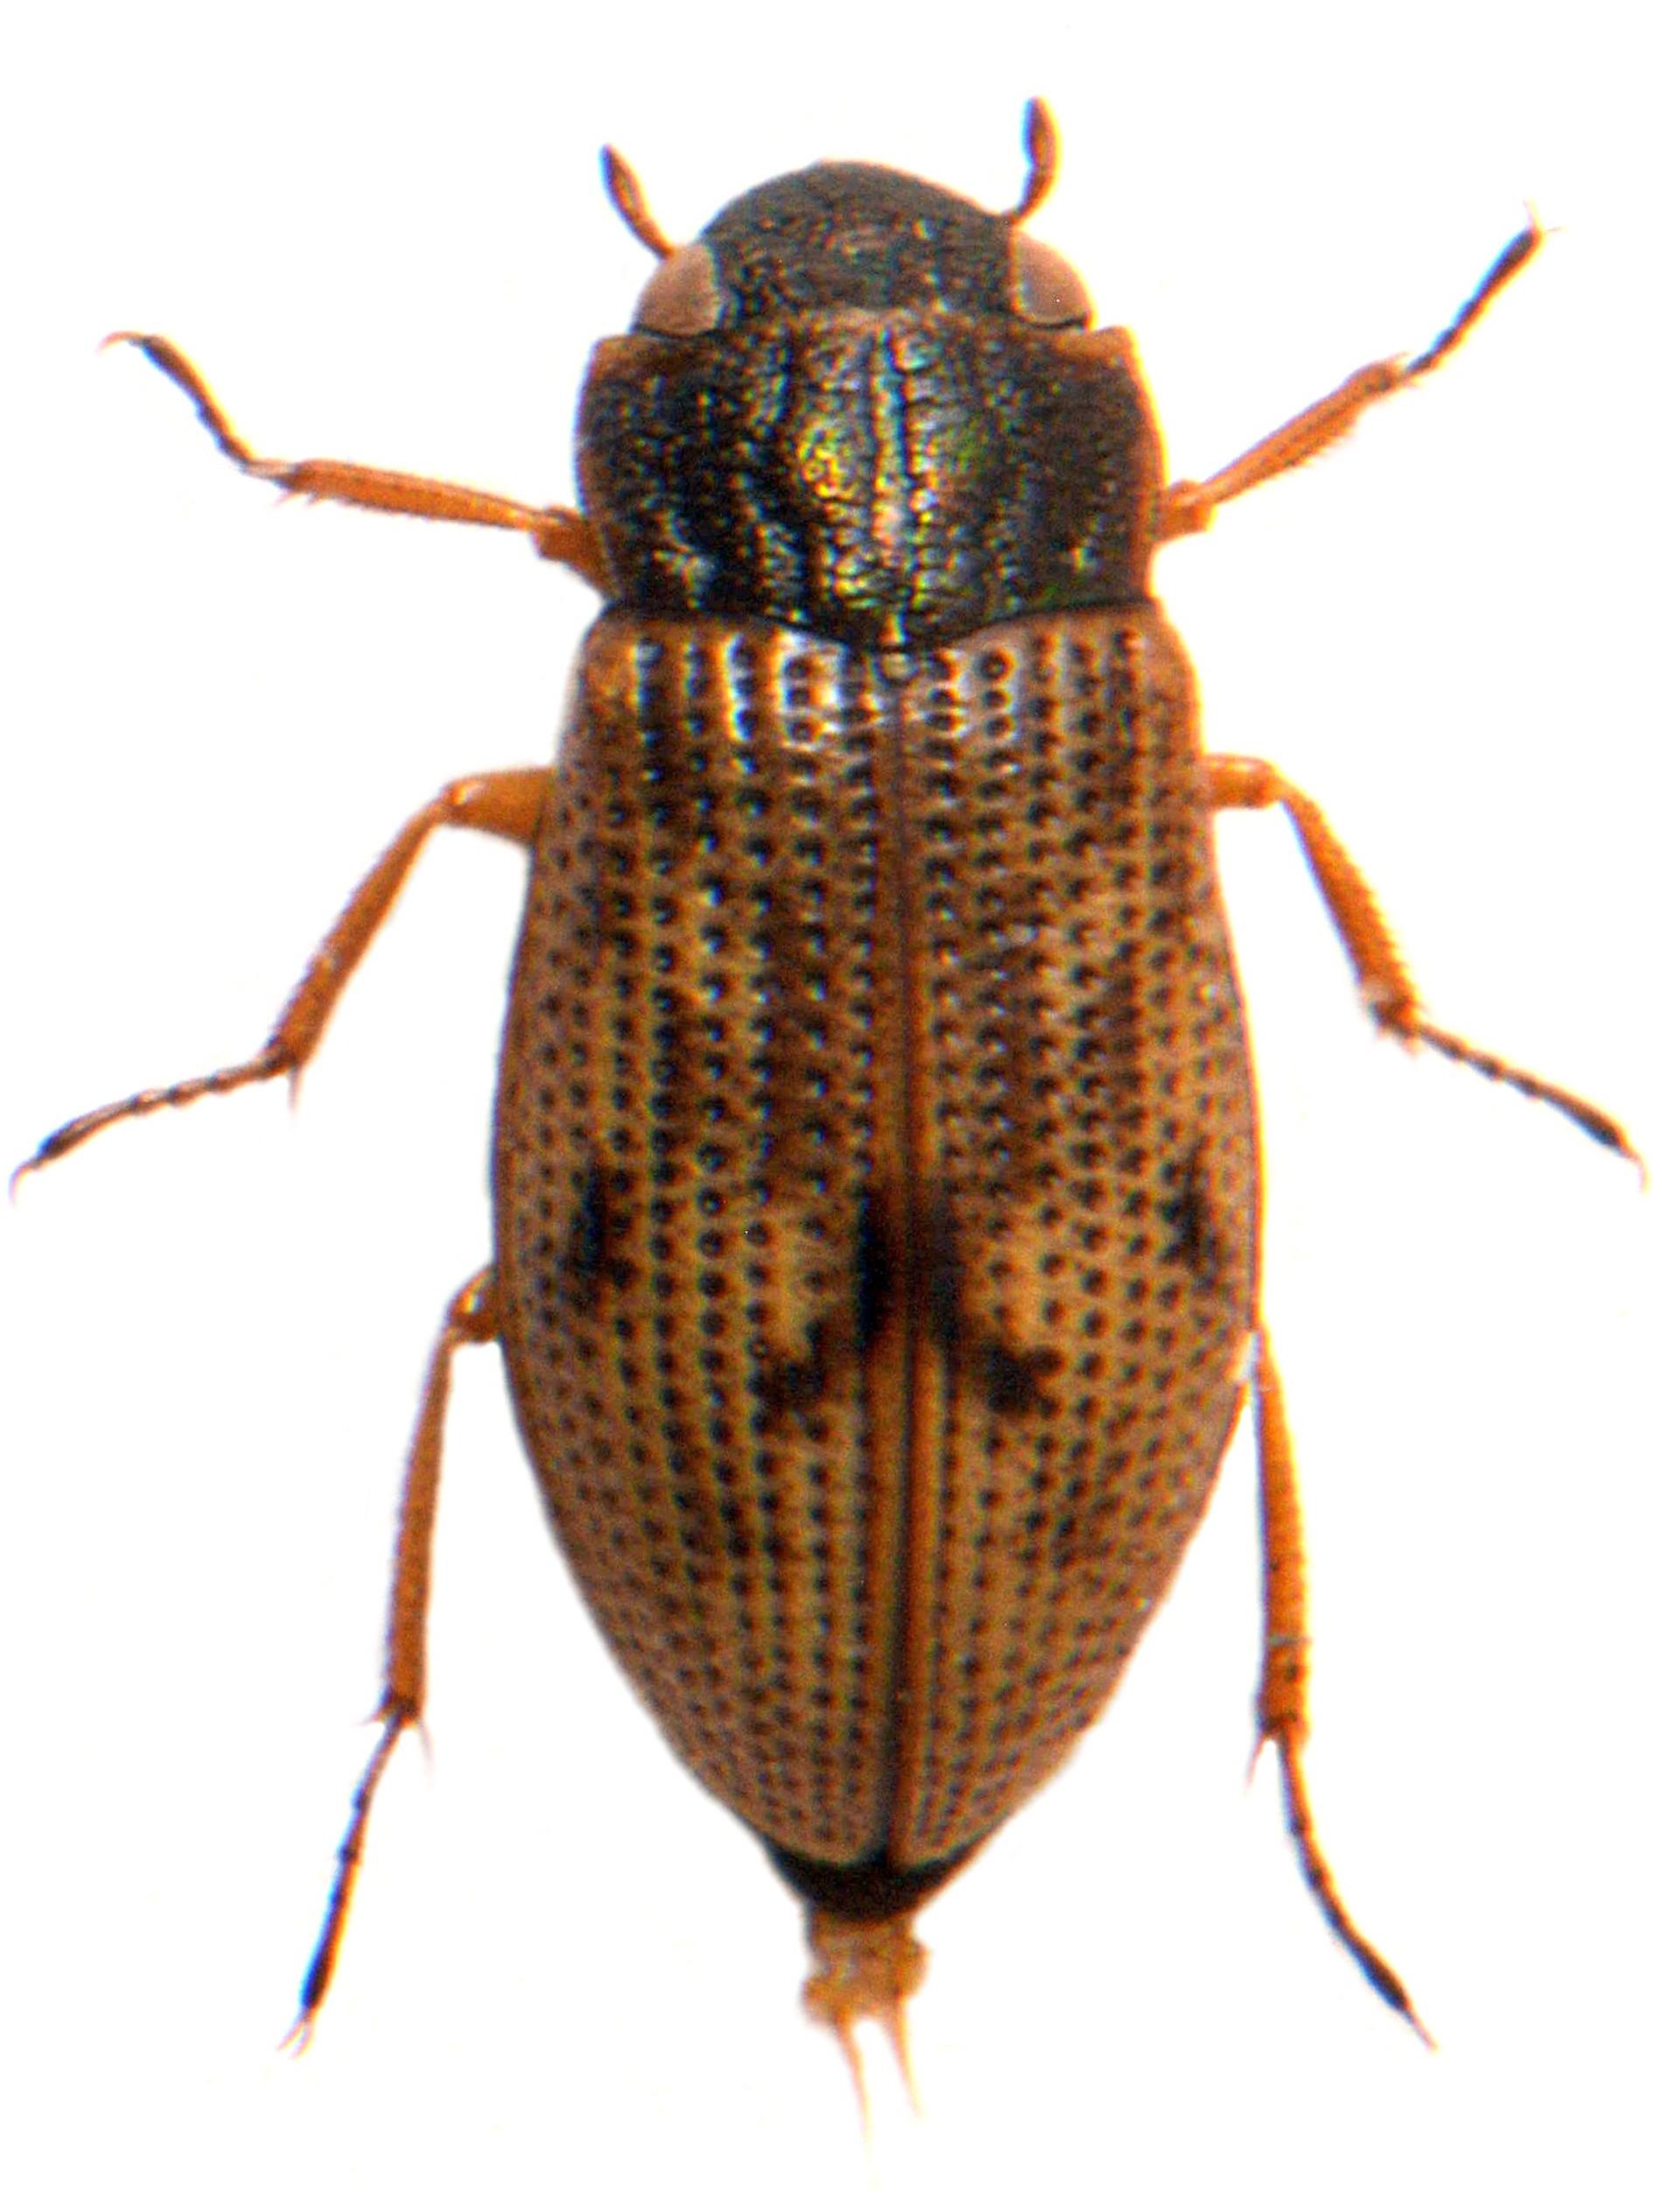 H. (Atracthelophorus) brevipalpis